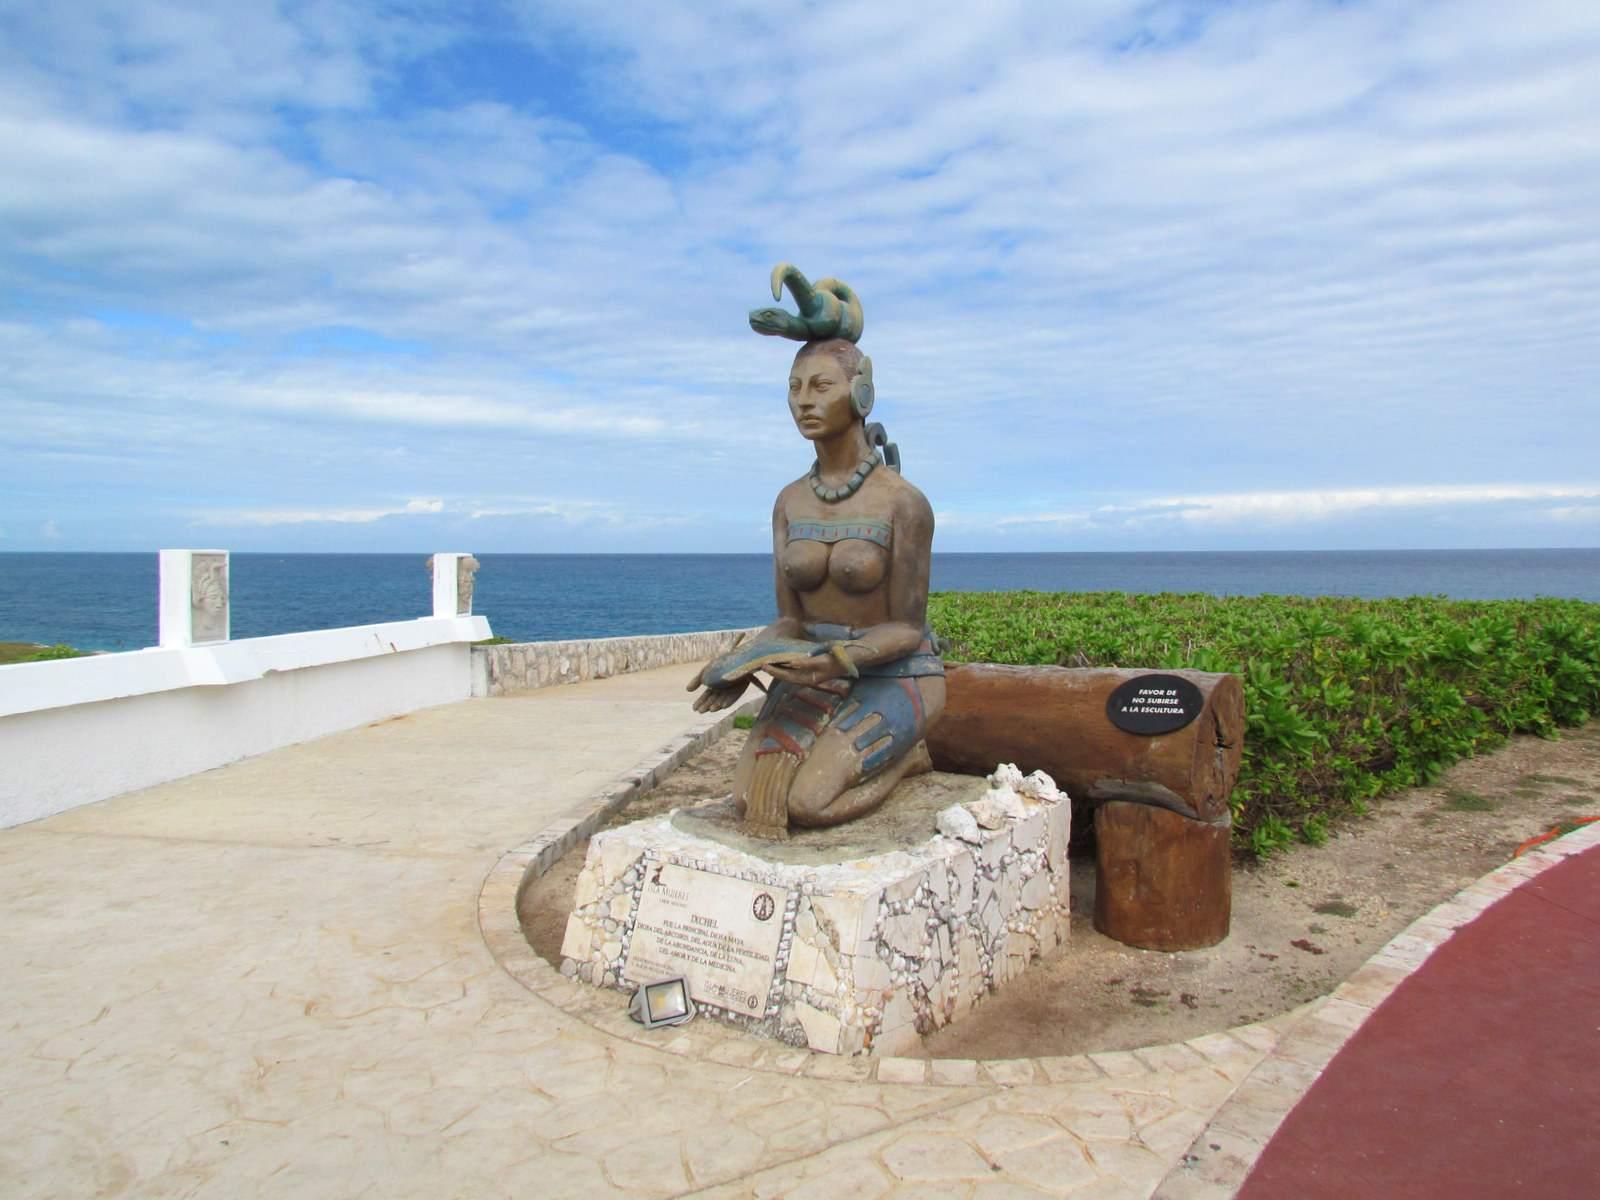 The Maya goddess Ixchel